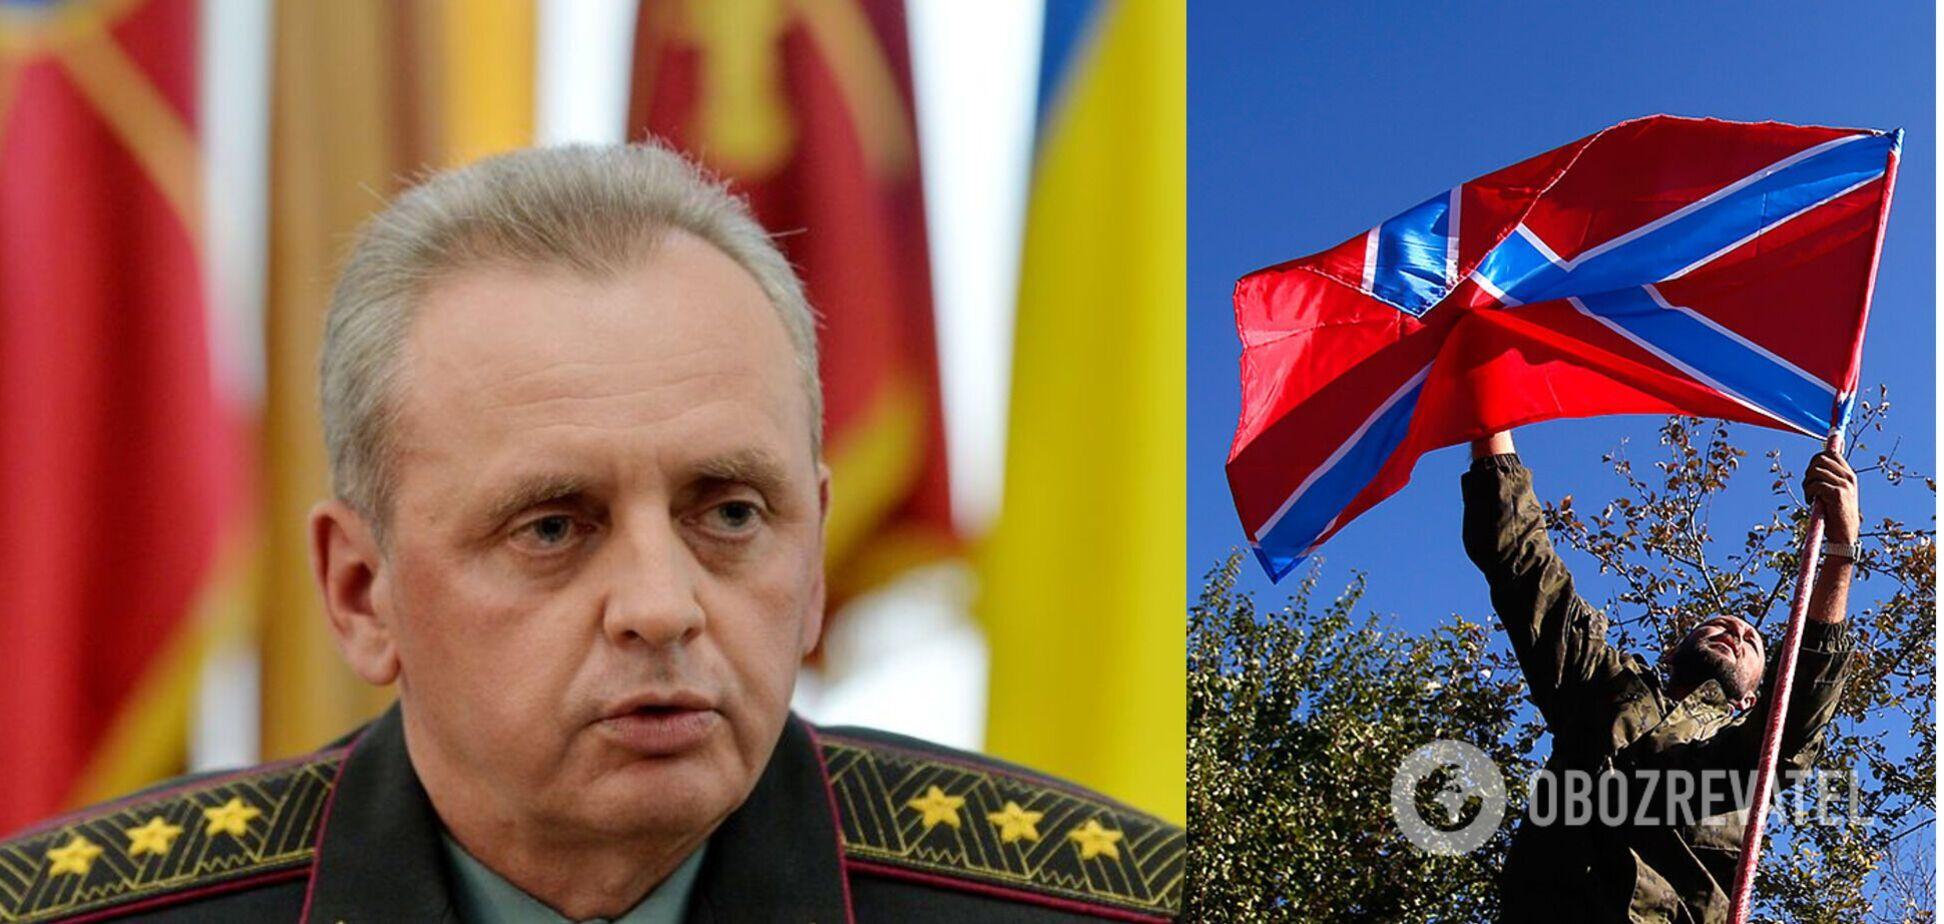 Ексначальник Генштабу ЗСУ Віктор Муженко